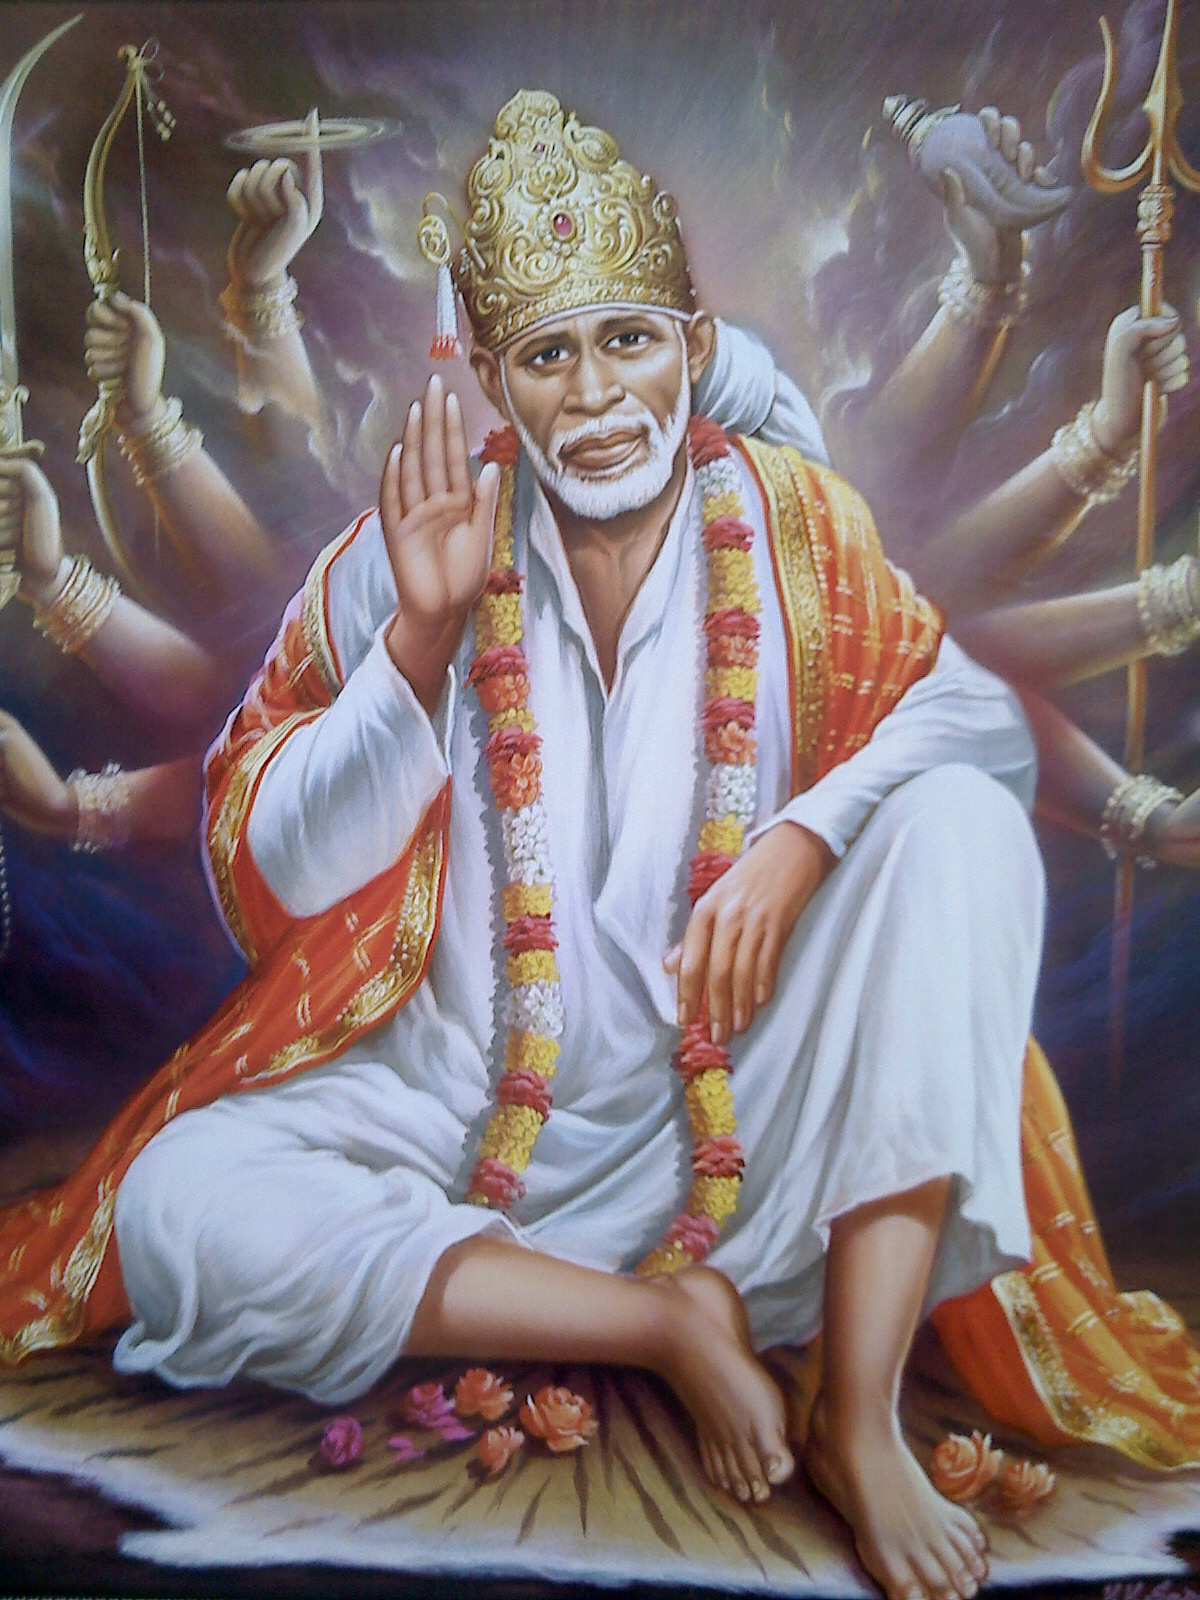 A Couple of Sai Baba Experiences - Part 831